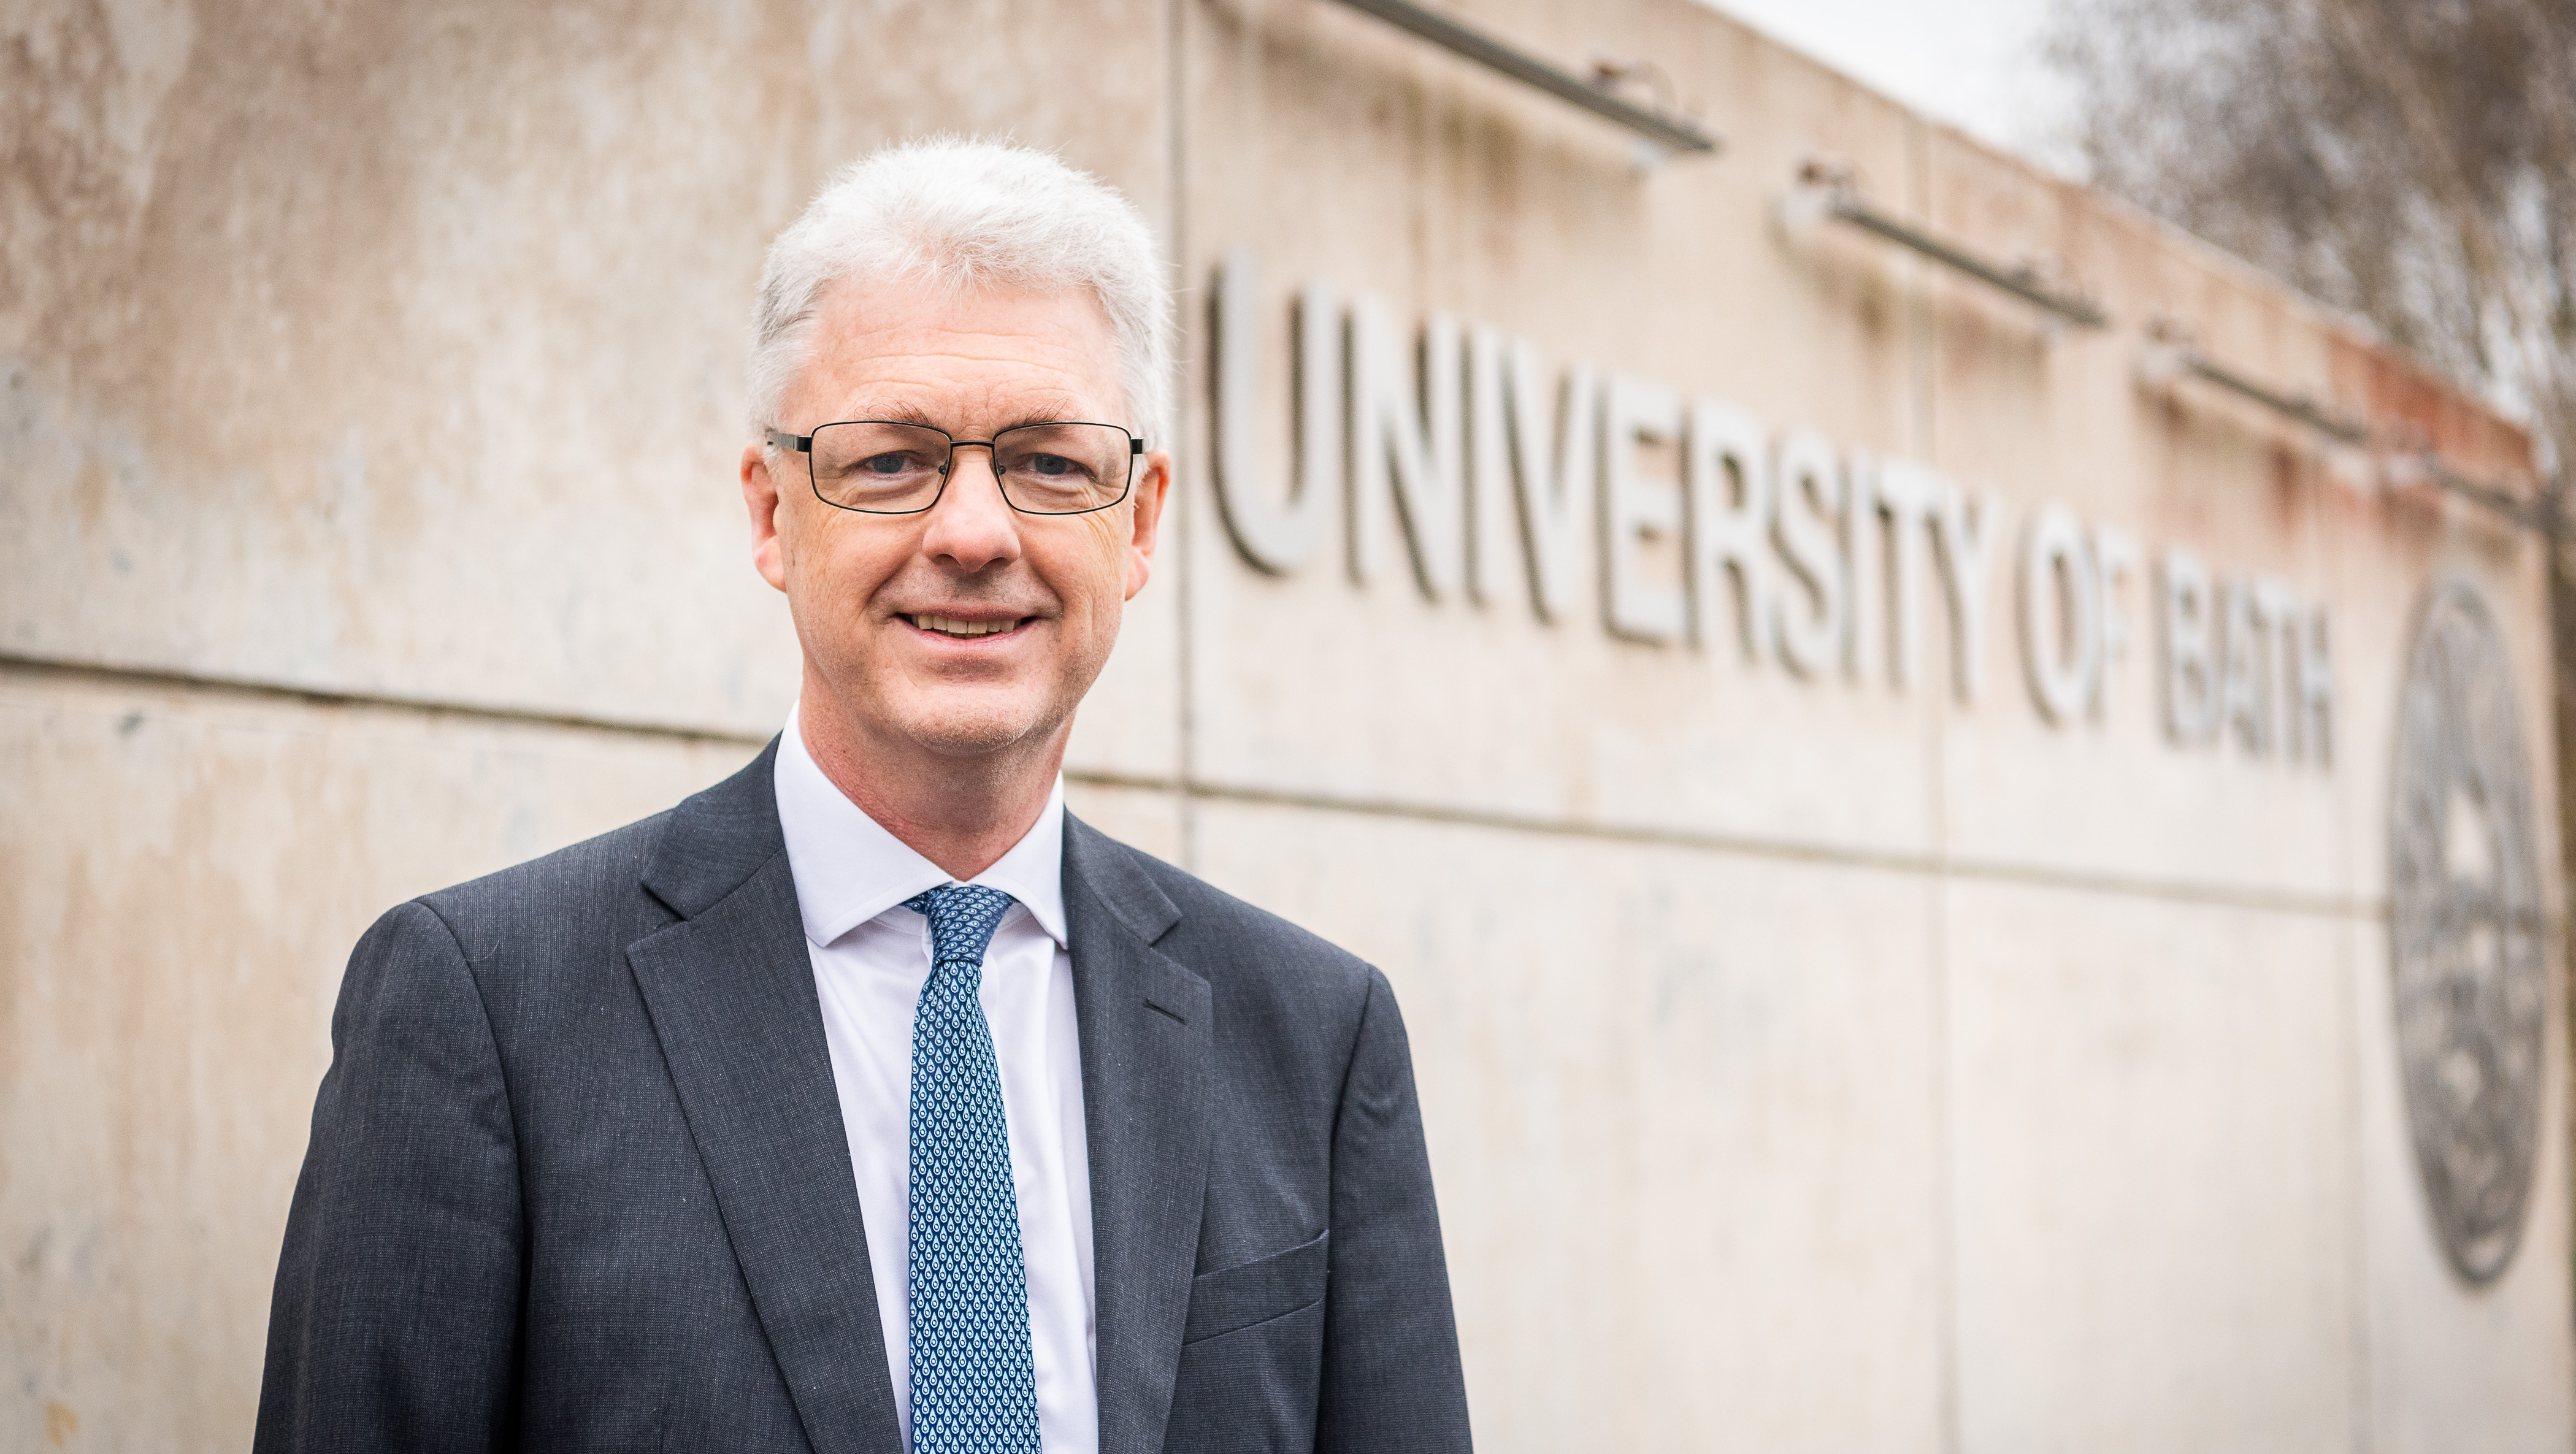 Professor Ian White, Vice-Chancellor and President